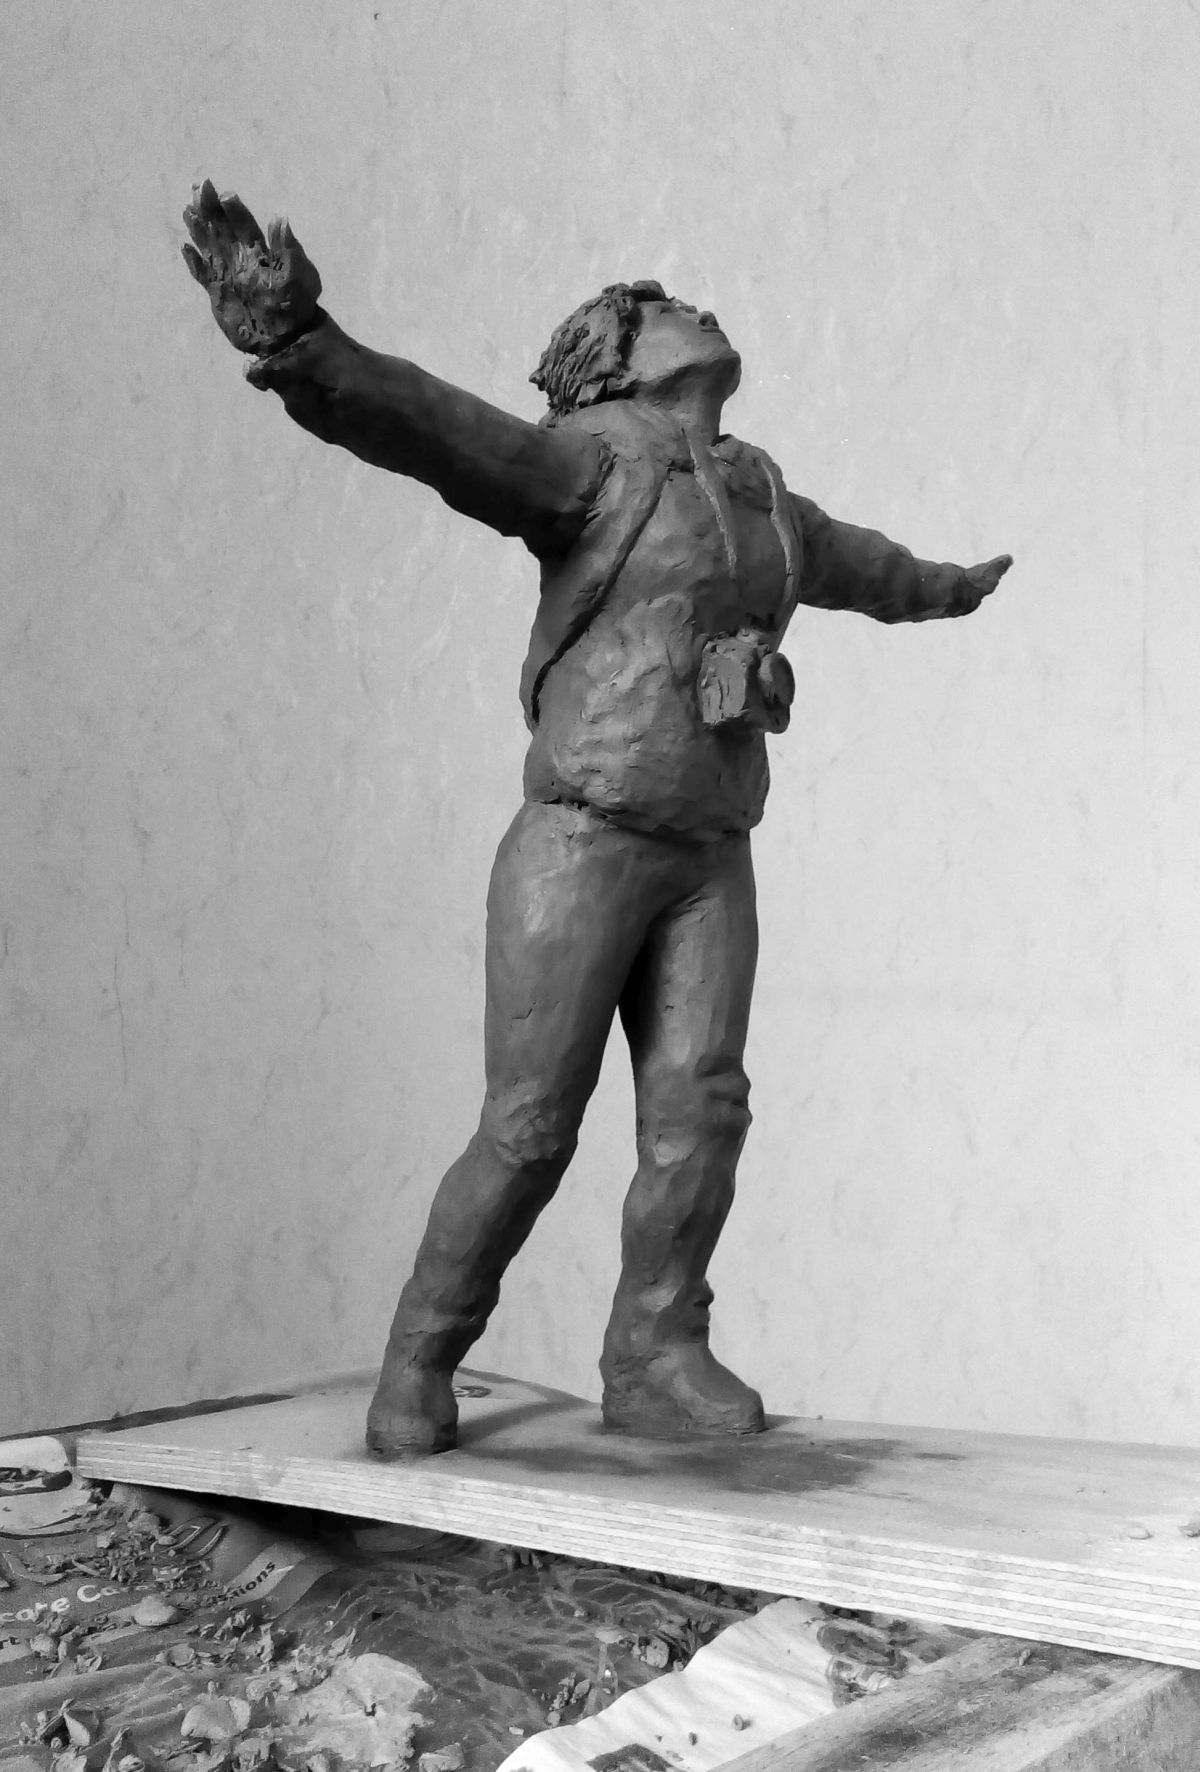 Эскиз памятника Ирине Славиной. Глина, 25 см. © Виктор Корб, 2021. Вид в три четверти, спереди, справа, снизу.